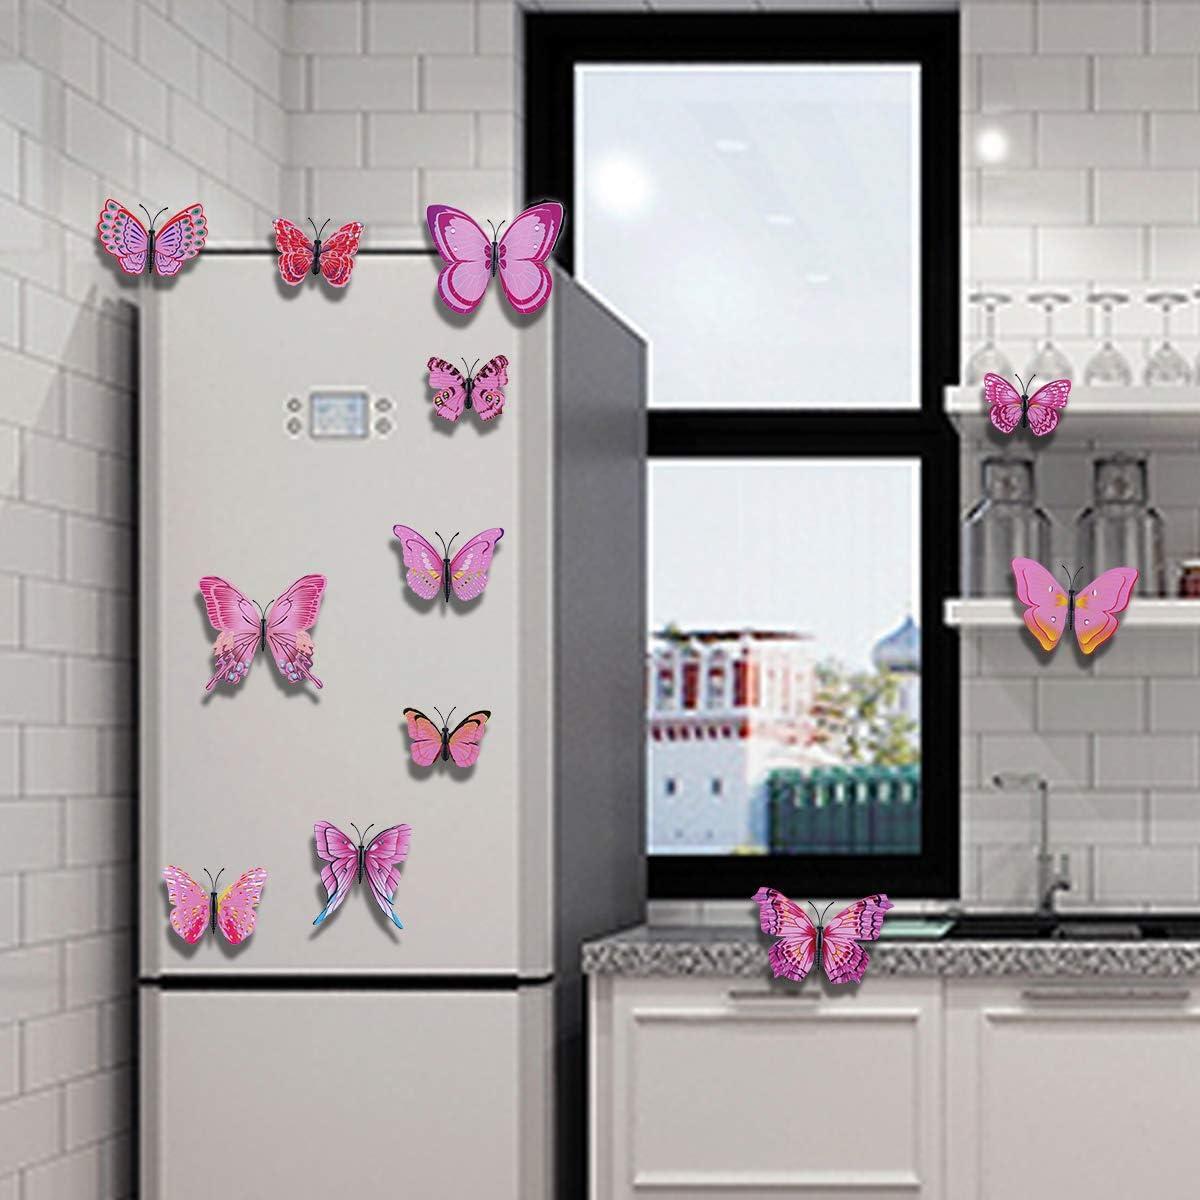 Derbway 12 Pieces 3D Butterflies Wall Stickers,Double 3D Wings,DIY Wall Decoration Crafts Butterflies for Kids Room,Party Decor,Garden Plants Decor Purple